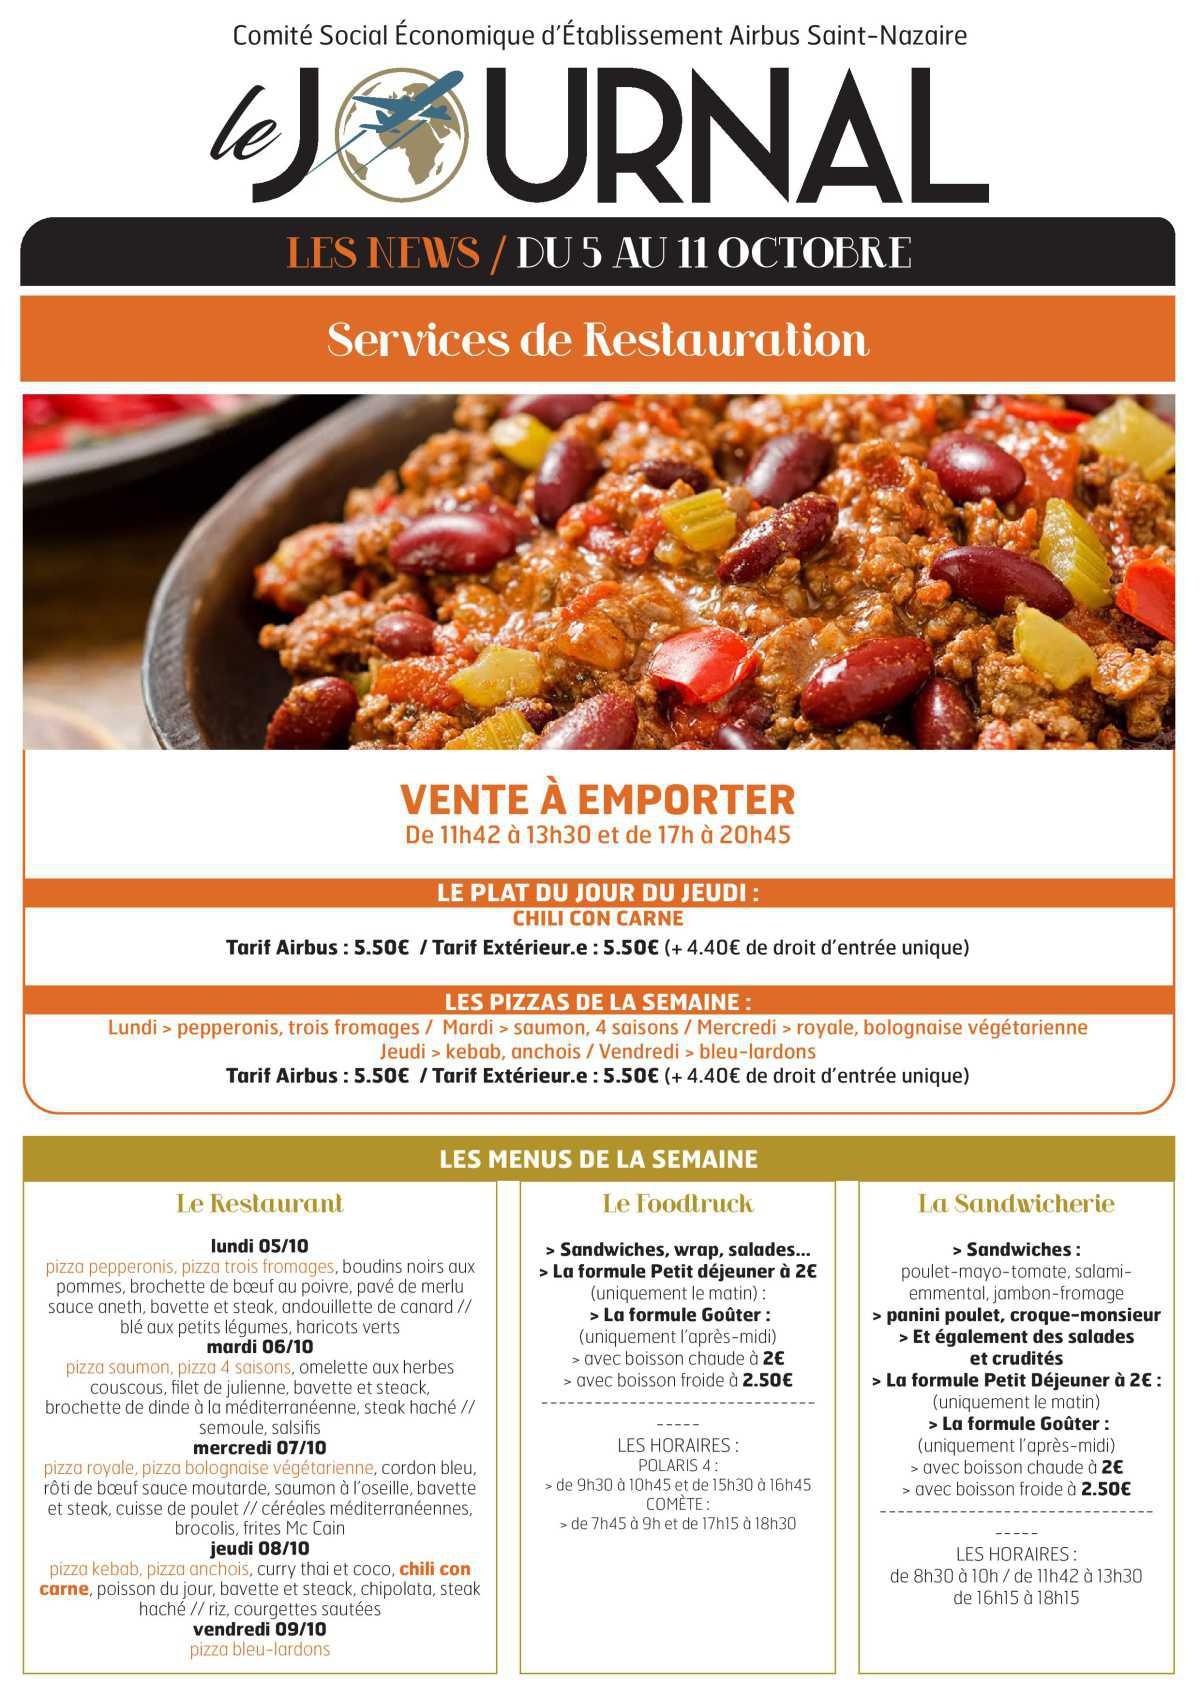 Infos CSE / COOP semaine 41